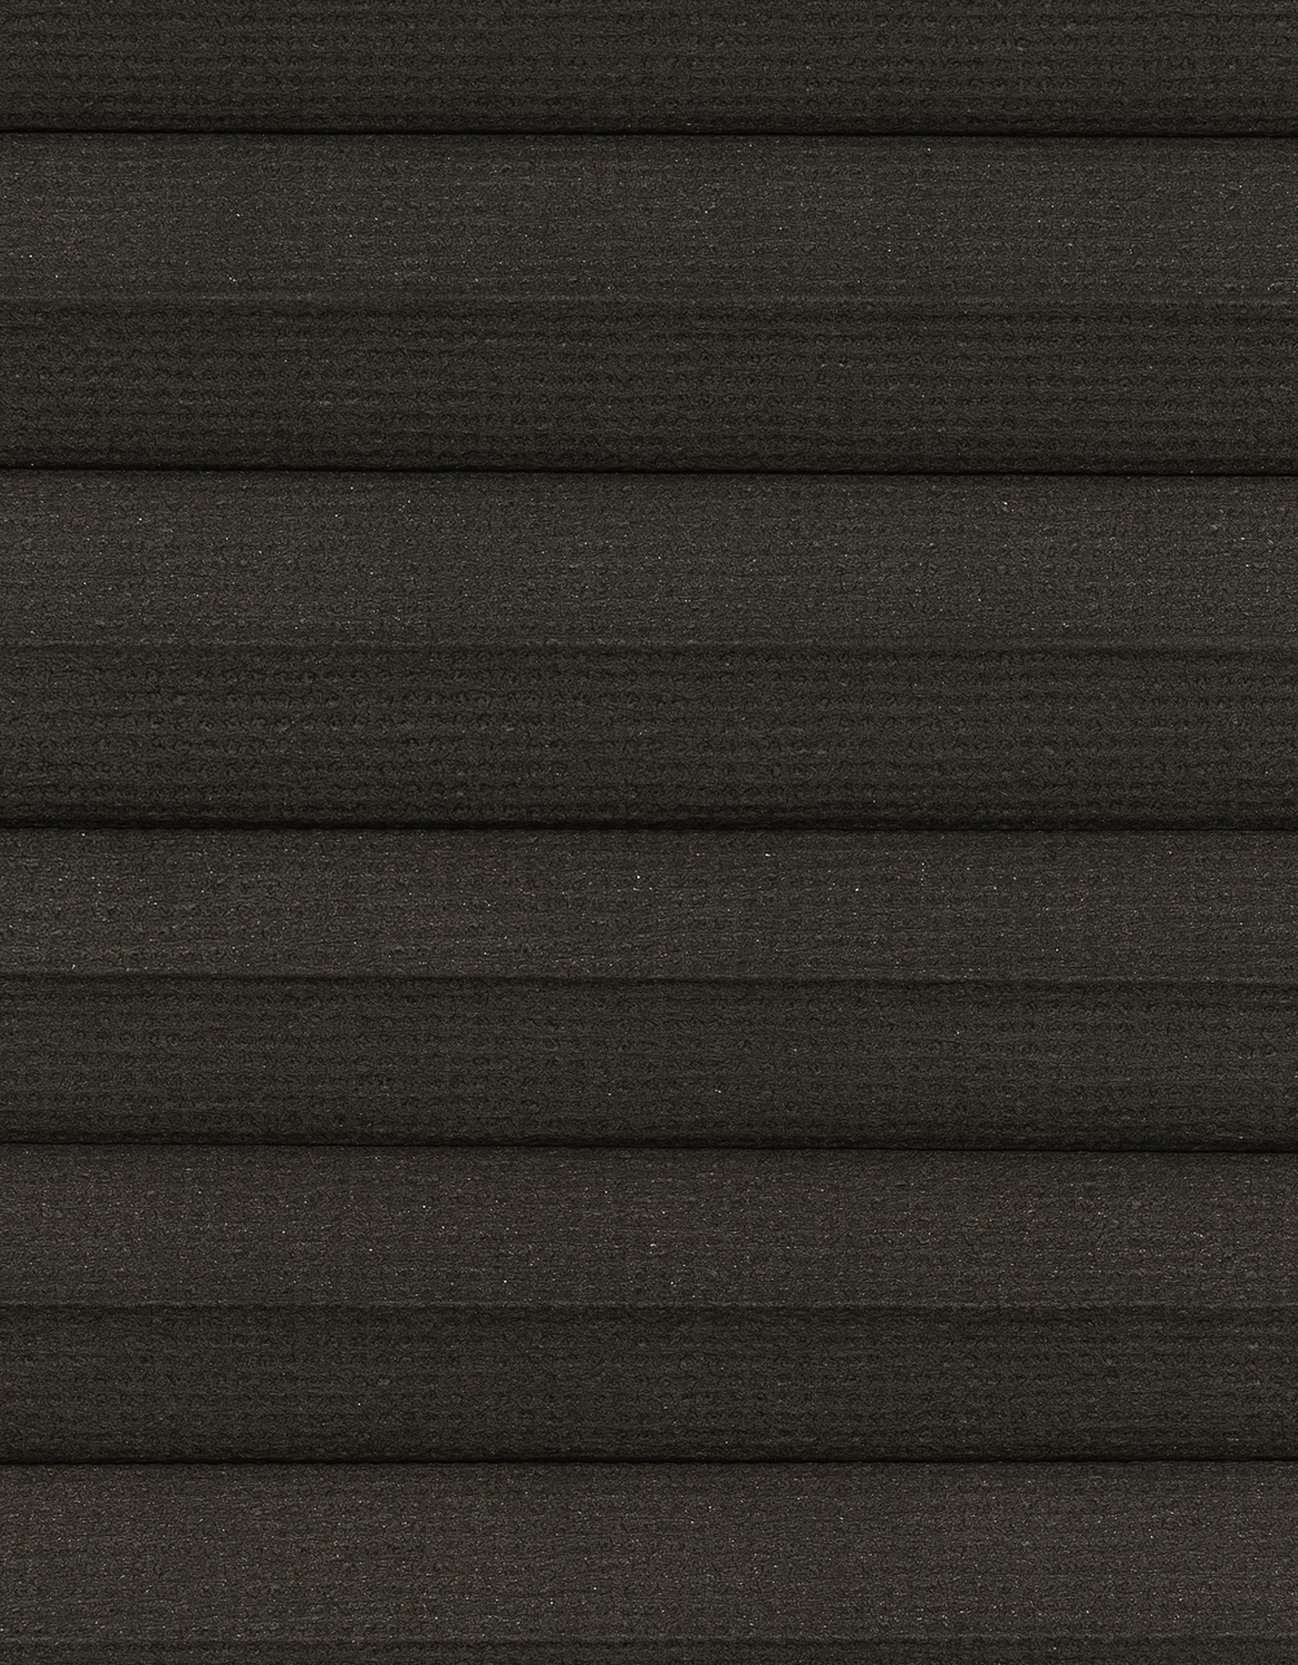 Semi-transparant Dupligordijnen 25 mm Kleurstaal Basalt